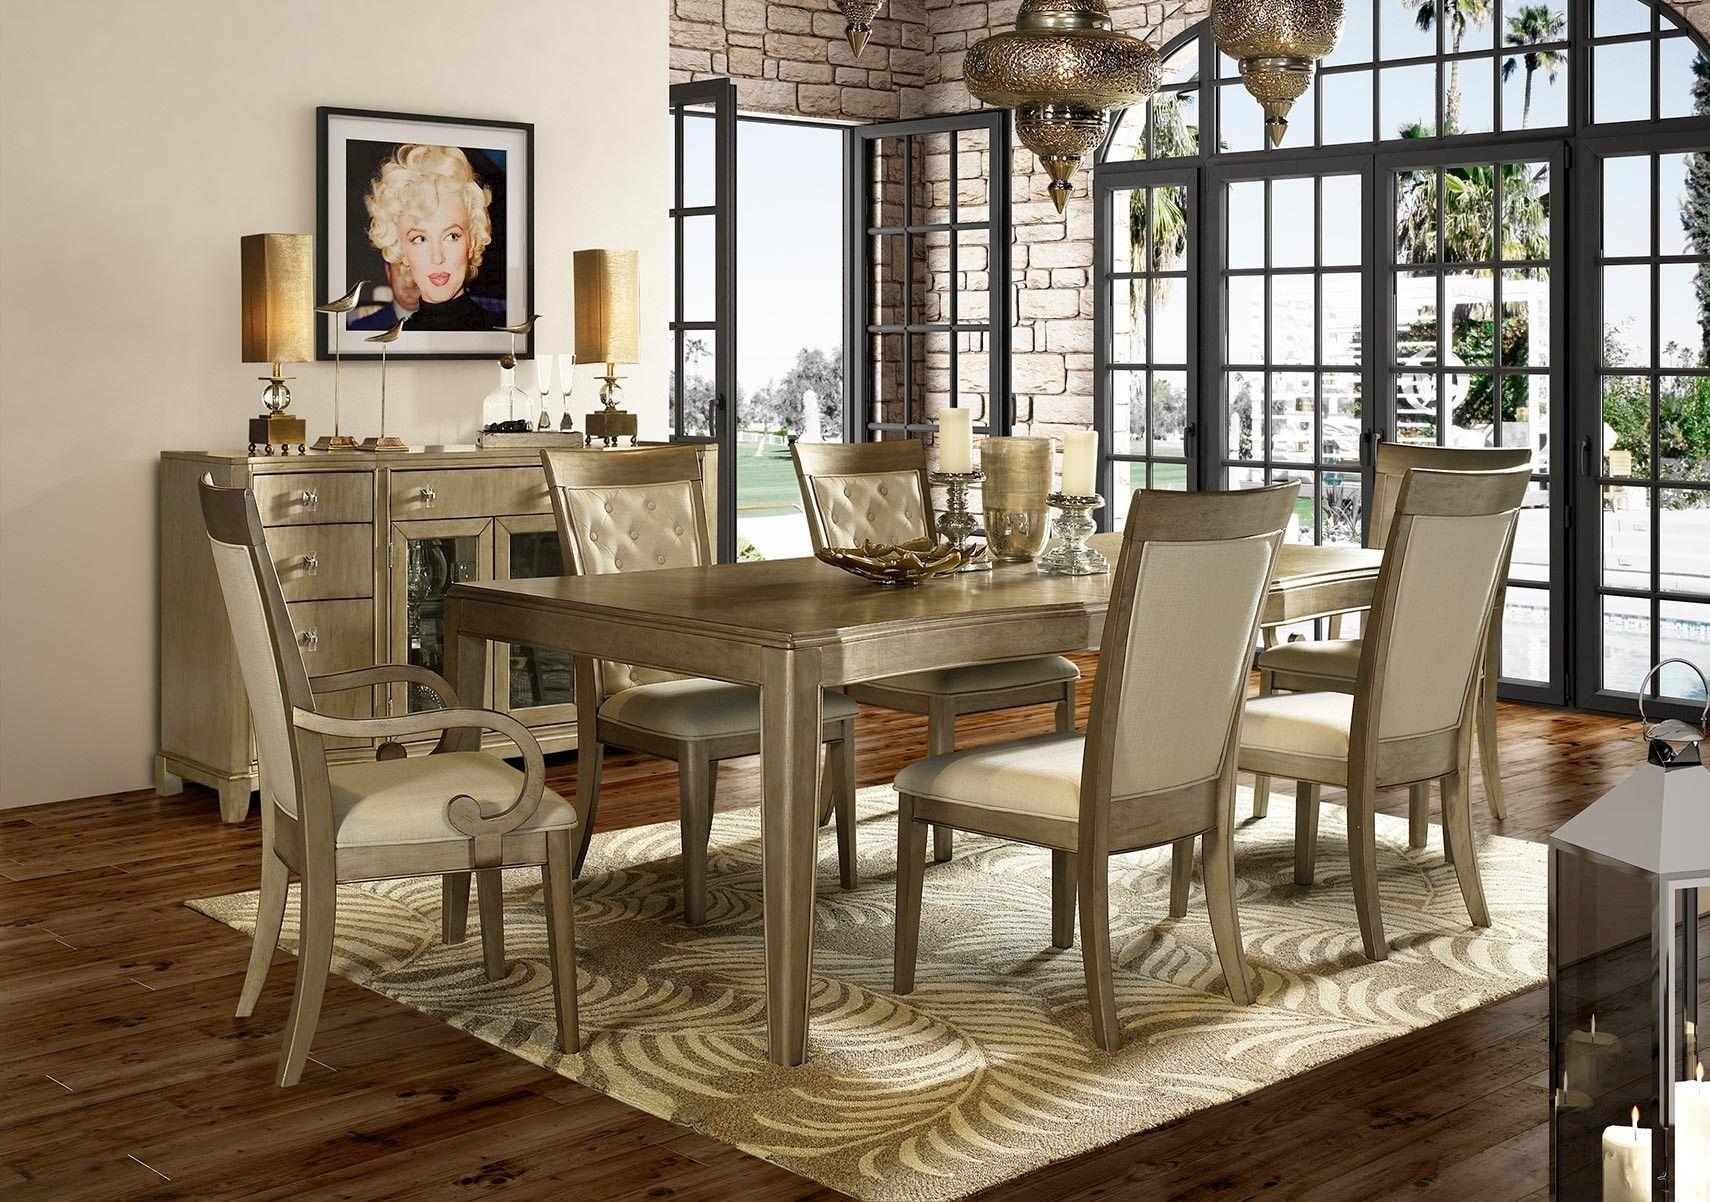 Lacks Monroe 7 Pc Dining Set Dining Room Sets Ashley Furniture Dining Room Metal Dining Room